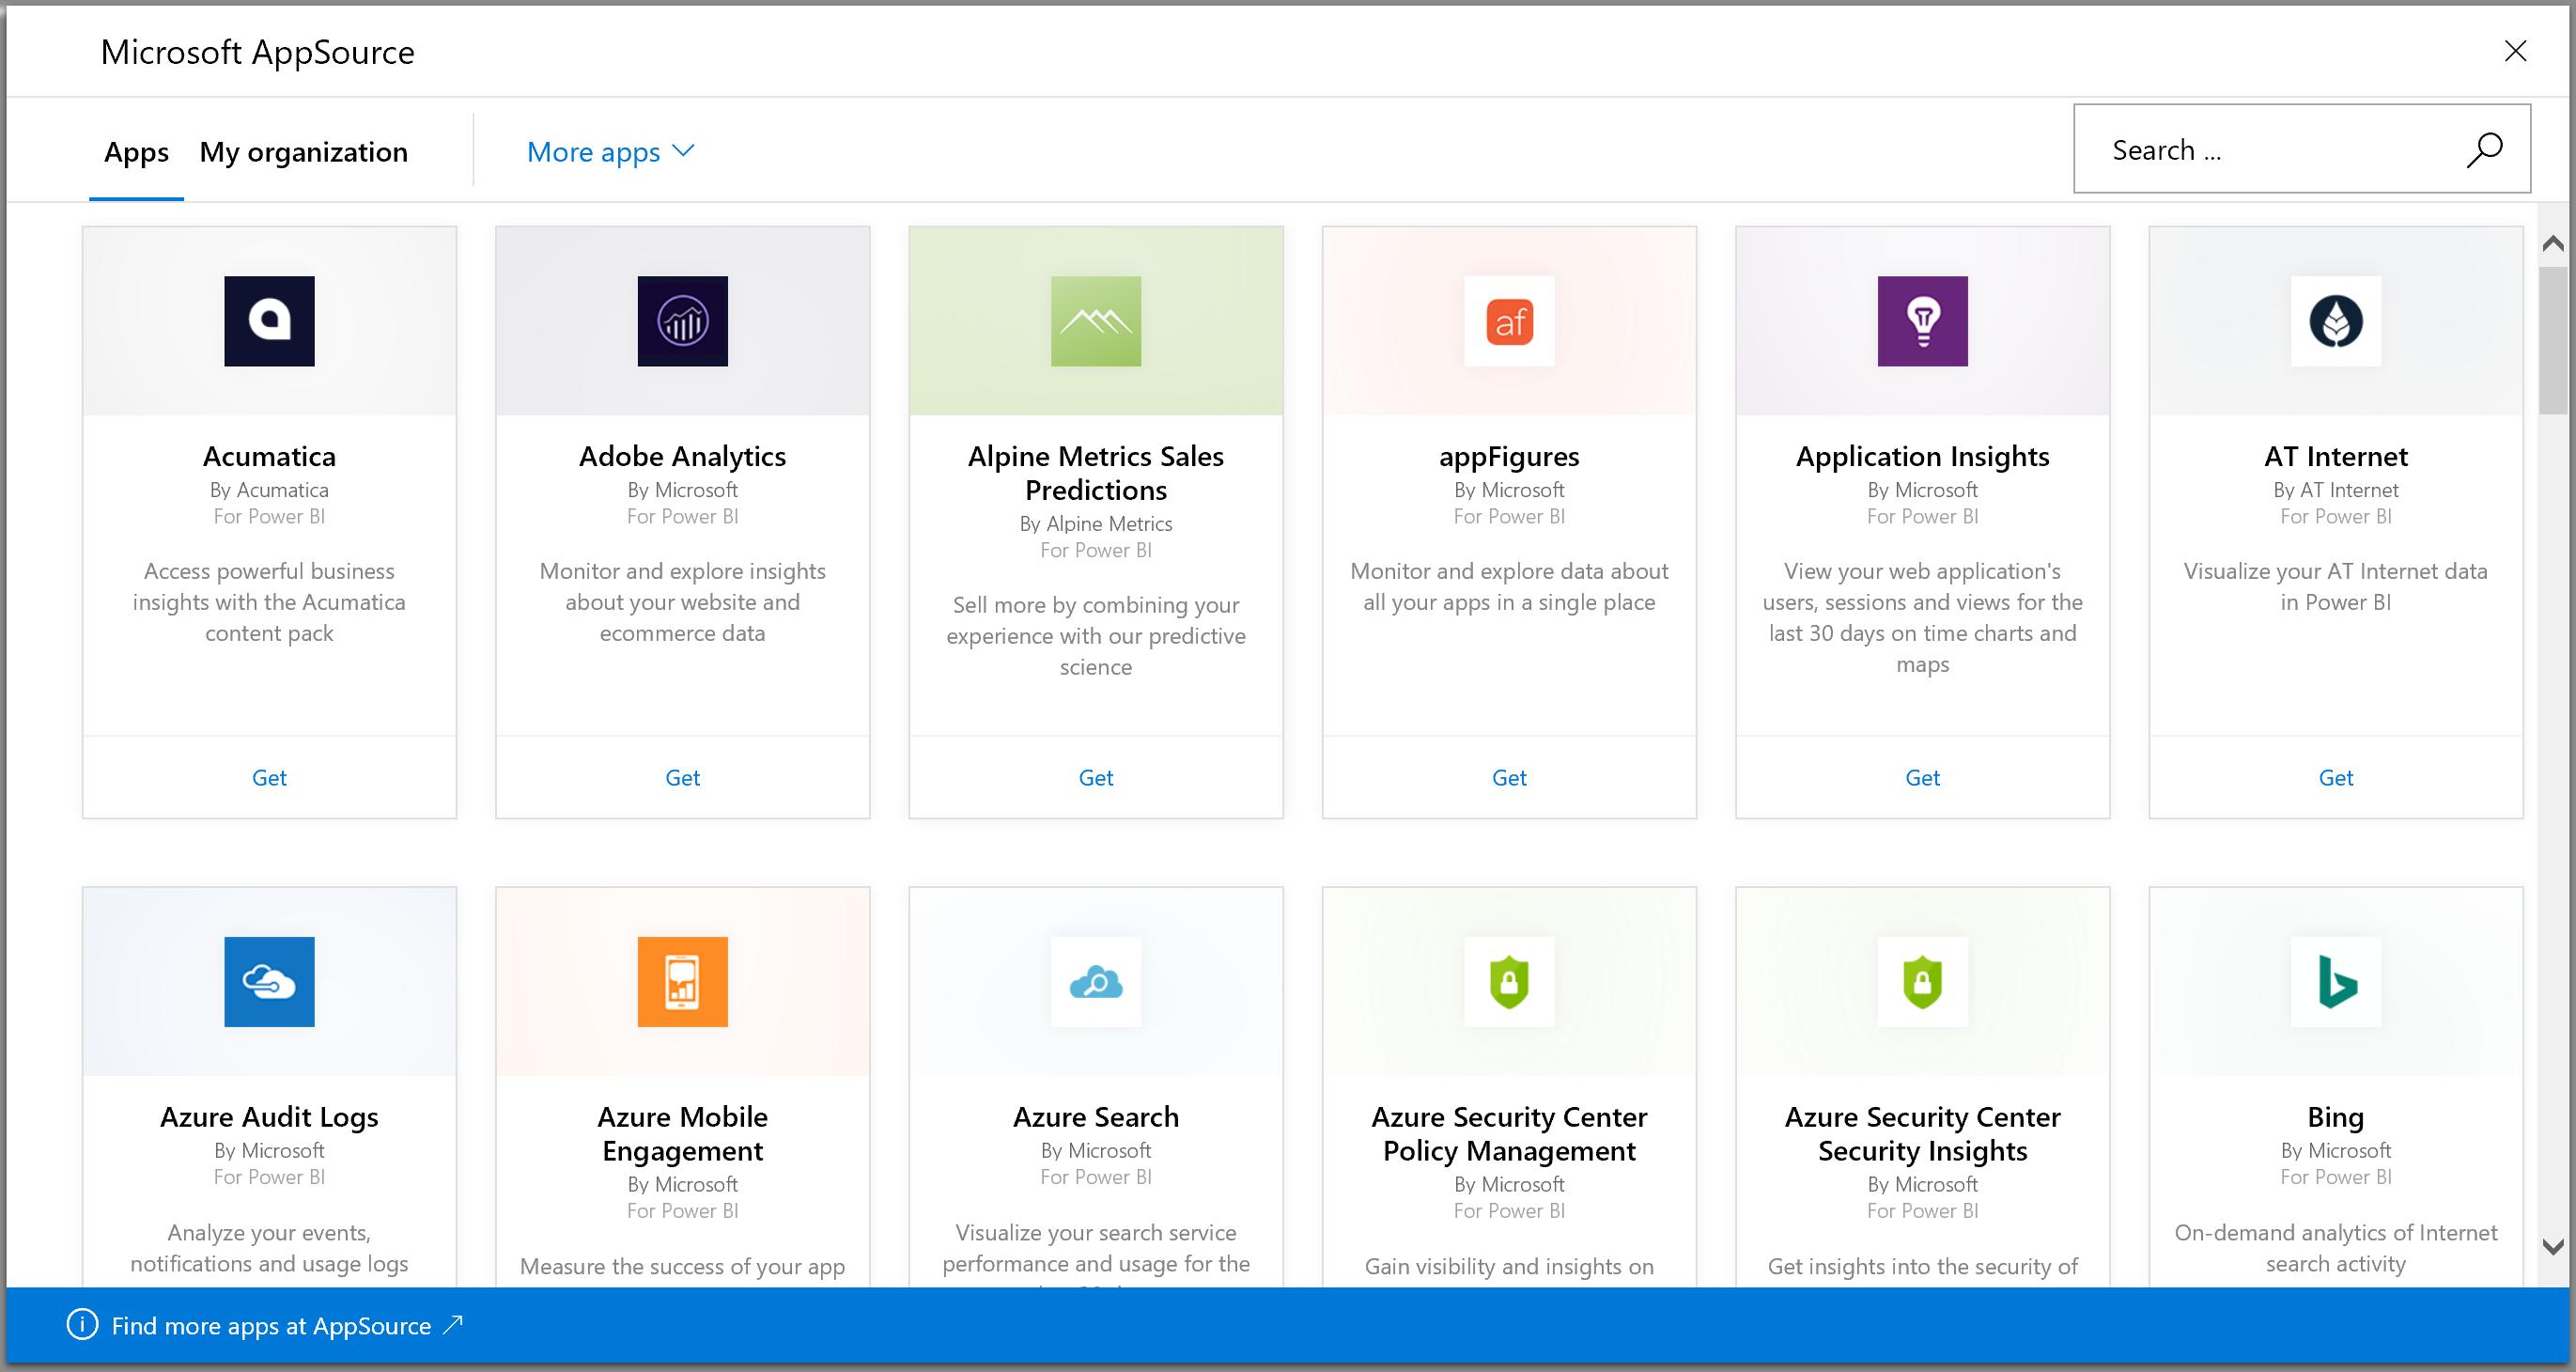 neue Verbindungs-Apps